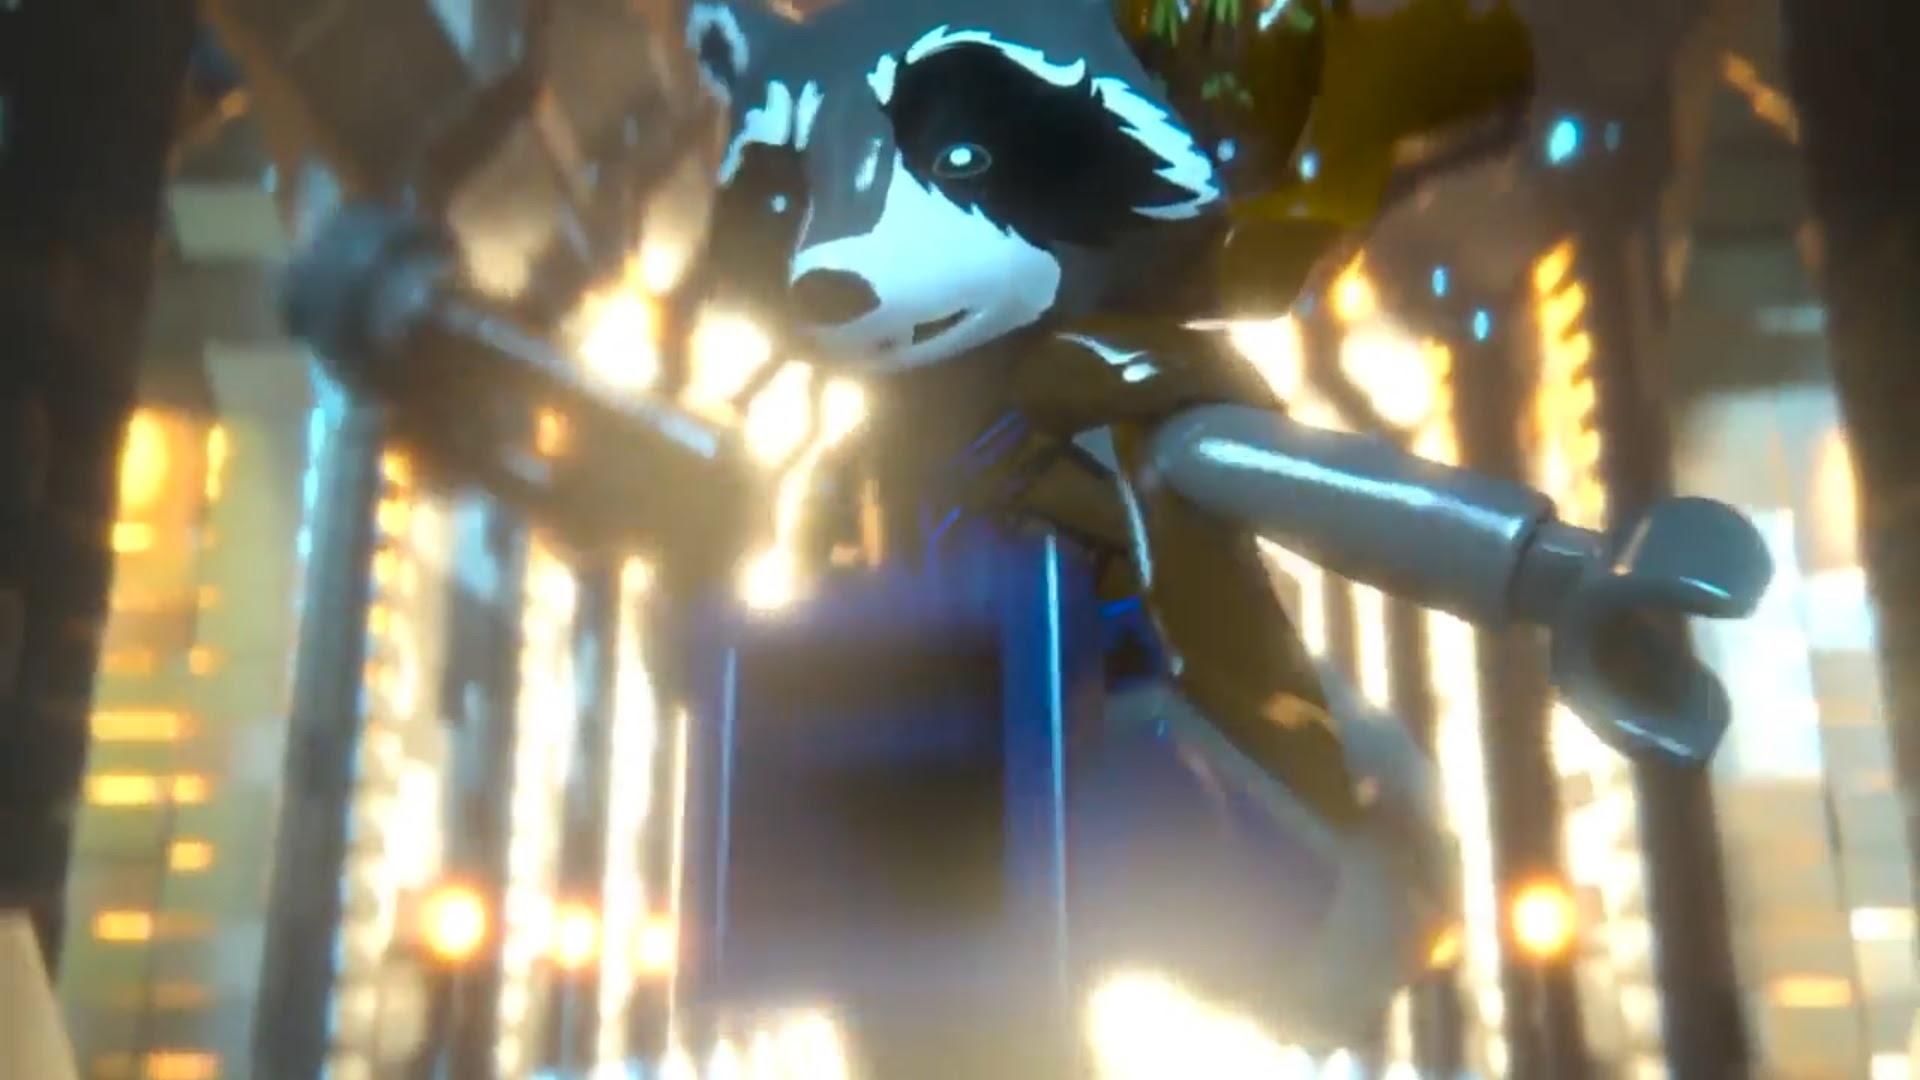 Here is the full trailer for Lego Marvel Super Heroes 2 screenshot